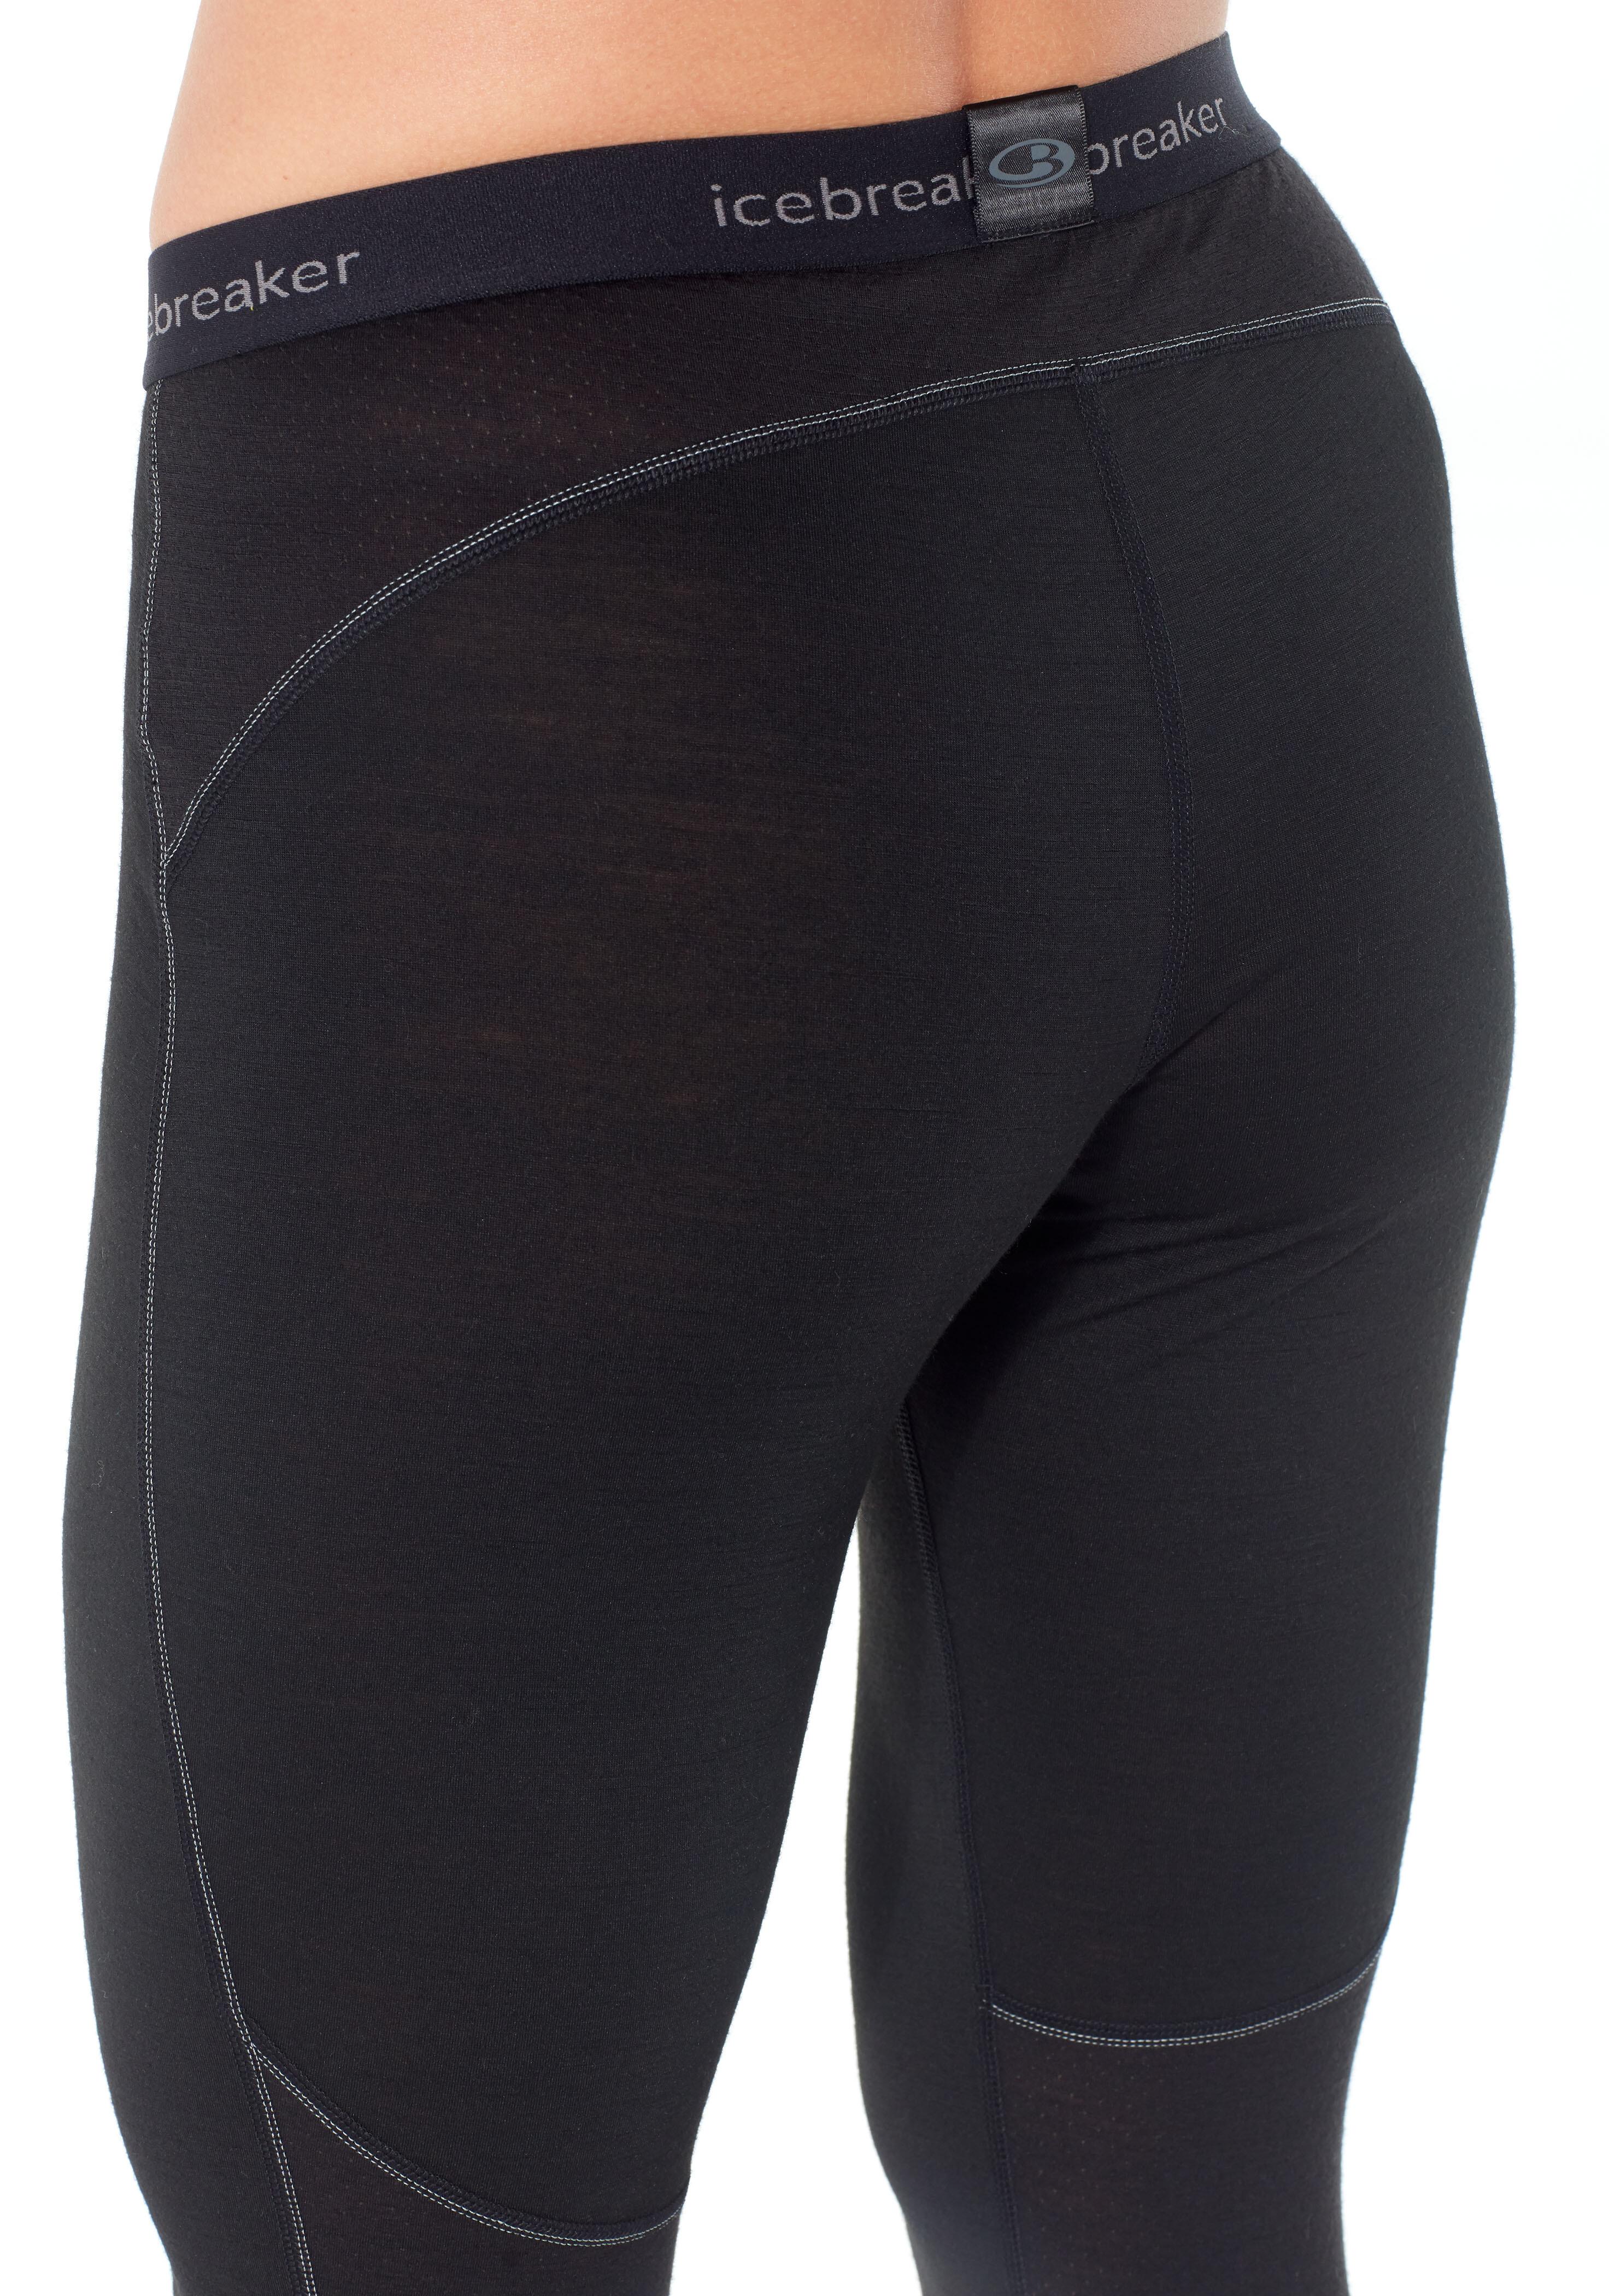 767975ed5b755 Icebreaker 150 Zone Underwear Women black at Bikester.co.uk